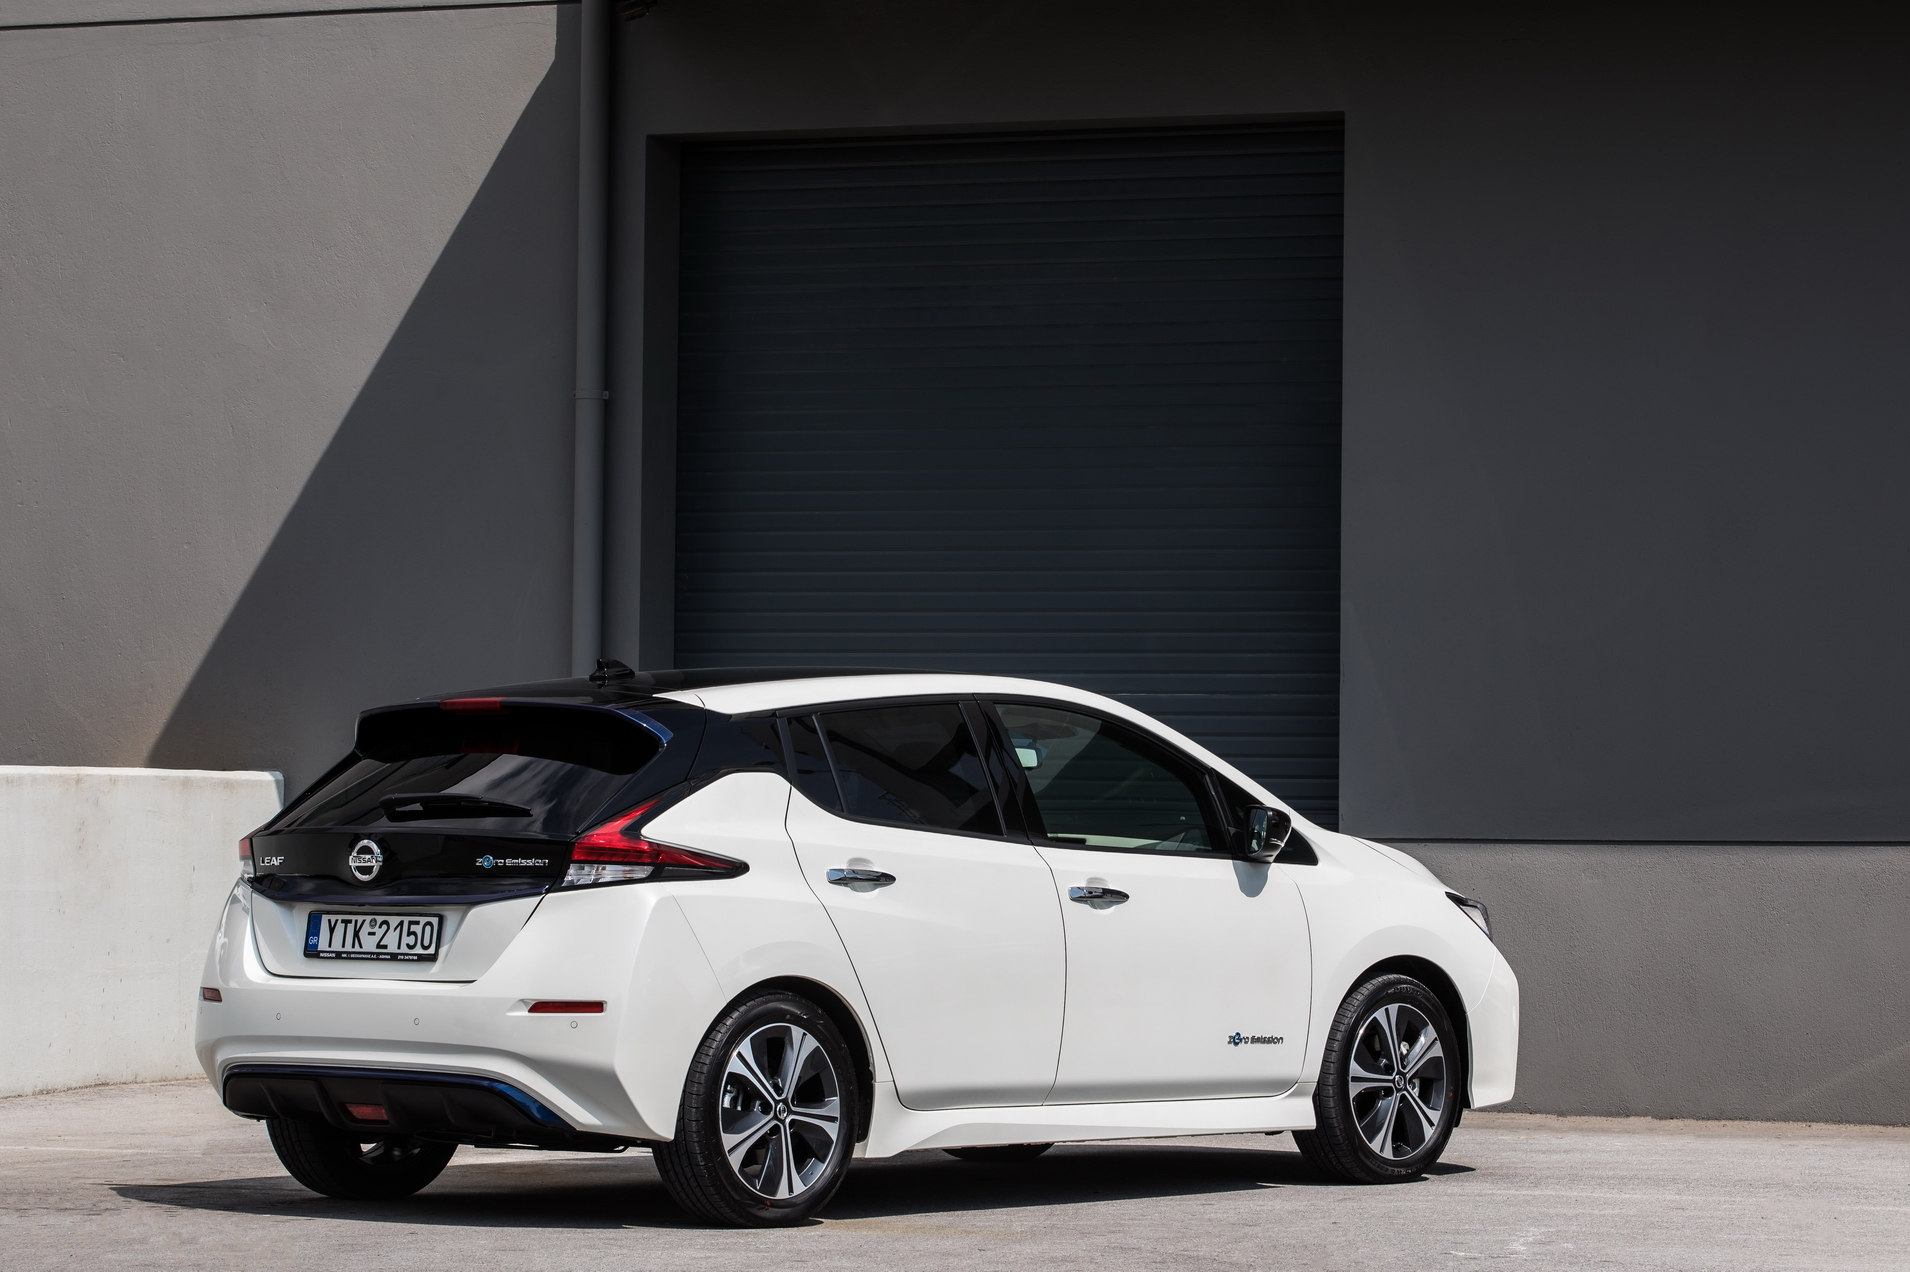 "Nέο Nissan LEAF: το πρώτο σε πωλήσεις στον κόσμο, κορυφαίας τεχνολογίας, αμιγώς ηλεκτροκίνητο μηδενικών εκπομπών ρύπων αυτοκίνητο, έφτασε στην Ελλάδα! Το νέο Nissan LEAF, ένα πρωτοποριακό αυτοκίνητο που έχει ήδη ξεκινήσει μια δυναμική εμπορική πορεία στην Ευρώπη, τώρα διατίθεται και στην Ελλάδα από τη Nissan Νικ. Ι. Θεοχαράκης Α.Ε. Το νέο Nissan LEAF είναι η επόμενη γενιά του αμιγώς ηλεκτροκίνητου αυτοκινήτου μηδενικών εκπομπών ρύπων, με τις καλύτερες πωλήσεις στον κόσμο. Περισσότεροι από 300.000 πελάτες έχουν επιλέξει το πρώτης γενιάς LEAF, από το 2010 όπου και κυκλοφόρησε. Τώρα το ολοκαίνουργιο μοντέλο προσφέρει ακόμη μεγαλύτερη εμβέλεια, βελτιωμένο δυναμικό σχεδιασμό, κορυφαίες τεχνολογίες υποστήριξης του οδηγού και βελτιωμένη συνδεσιμότητα. Αφού ψηφίστηκε ως ""Πράσινο"" Αυτοκίνητο της Χρονιάς και έλαβε την υψηλότερη δυνατή βαθμολογία με πέντε αστέρια στην ασφάλεια, από το Πρόγραμμα Αξιολόγησης Νέων Αυτοκινήτων στην Ιαπωνία, τώρα έρχεται να προστεθεί στο ""χαρτοφυλάκιο"" του νέου Nissan LEAF και η κορυφαία βαθμολογία των 5 αστέρων στις πλέον αυστηρές δοκιμές ασφάλειας του ανεξάρτητου ευρωπαϊκού οργανισμού ασφάλειας, Euro NCAP. Ένας νέος τρόπος σκέψης Το Nissan LEAF είναι η ενσάρκωση του Nissan Intelligent Mobility. Είναι μια εντελώς νέα εμπειρία οδήγησης, σχεδιασμένη να μετακινεί τους ανθρώπους με μεγαλύτερη ευχαρίστηση, εμπιστοσύνη και σύνδεση με τον κόσμο γύρω τους. Αυτή η νέα πρόταση αγοράς, περιλαμβάνει τρεις κύριους πυλώνες : α) το Intelligent Power, που συγκροτείται από το νέο, προηγμένο e-powertrain 40kW του LEAF, με βελτιωμένη ενεργειακή απόδοση, αυξημένη ροπή αλλά και ισχύ εξόδου για πιο συναρπαστική οδήγηση, β) το Intelligent Driving, μια τεχνολογία που έχει σχεδιαστεί για να βελτιώνει την αυτοπεποίθηση του οδηγού, ενισχύοντας την ασφάλεια και μειώνοντας το στρες και γ) το Nissan Intelligent Integration , τη σύνδεση του αυτοκινήτου με την ευρύτερη κοινωνία και τα ενεργειακά δίκτυα, μέσω της μοναδικής τεχνολογίας αμφίδρομης χρέωσης. Πολύ περισσότερο από ένα "